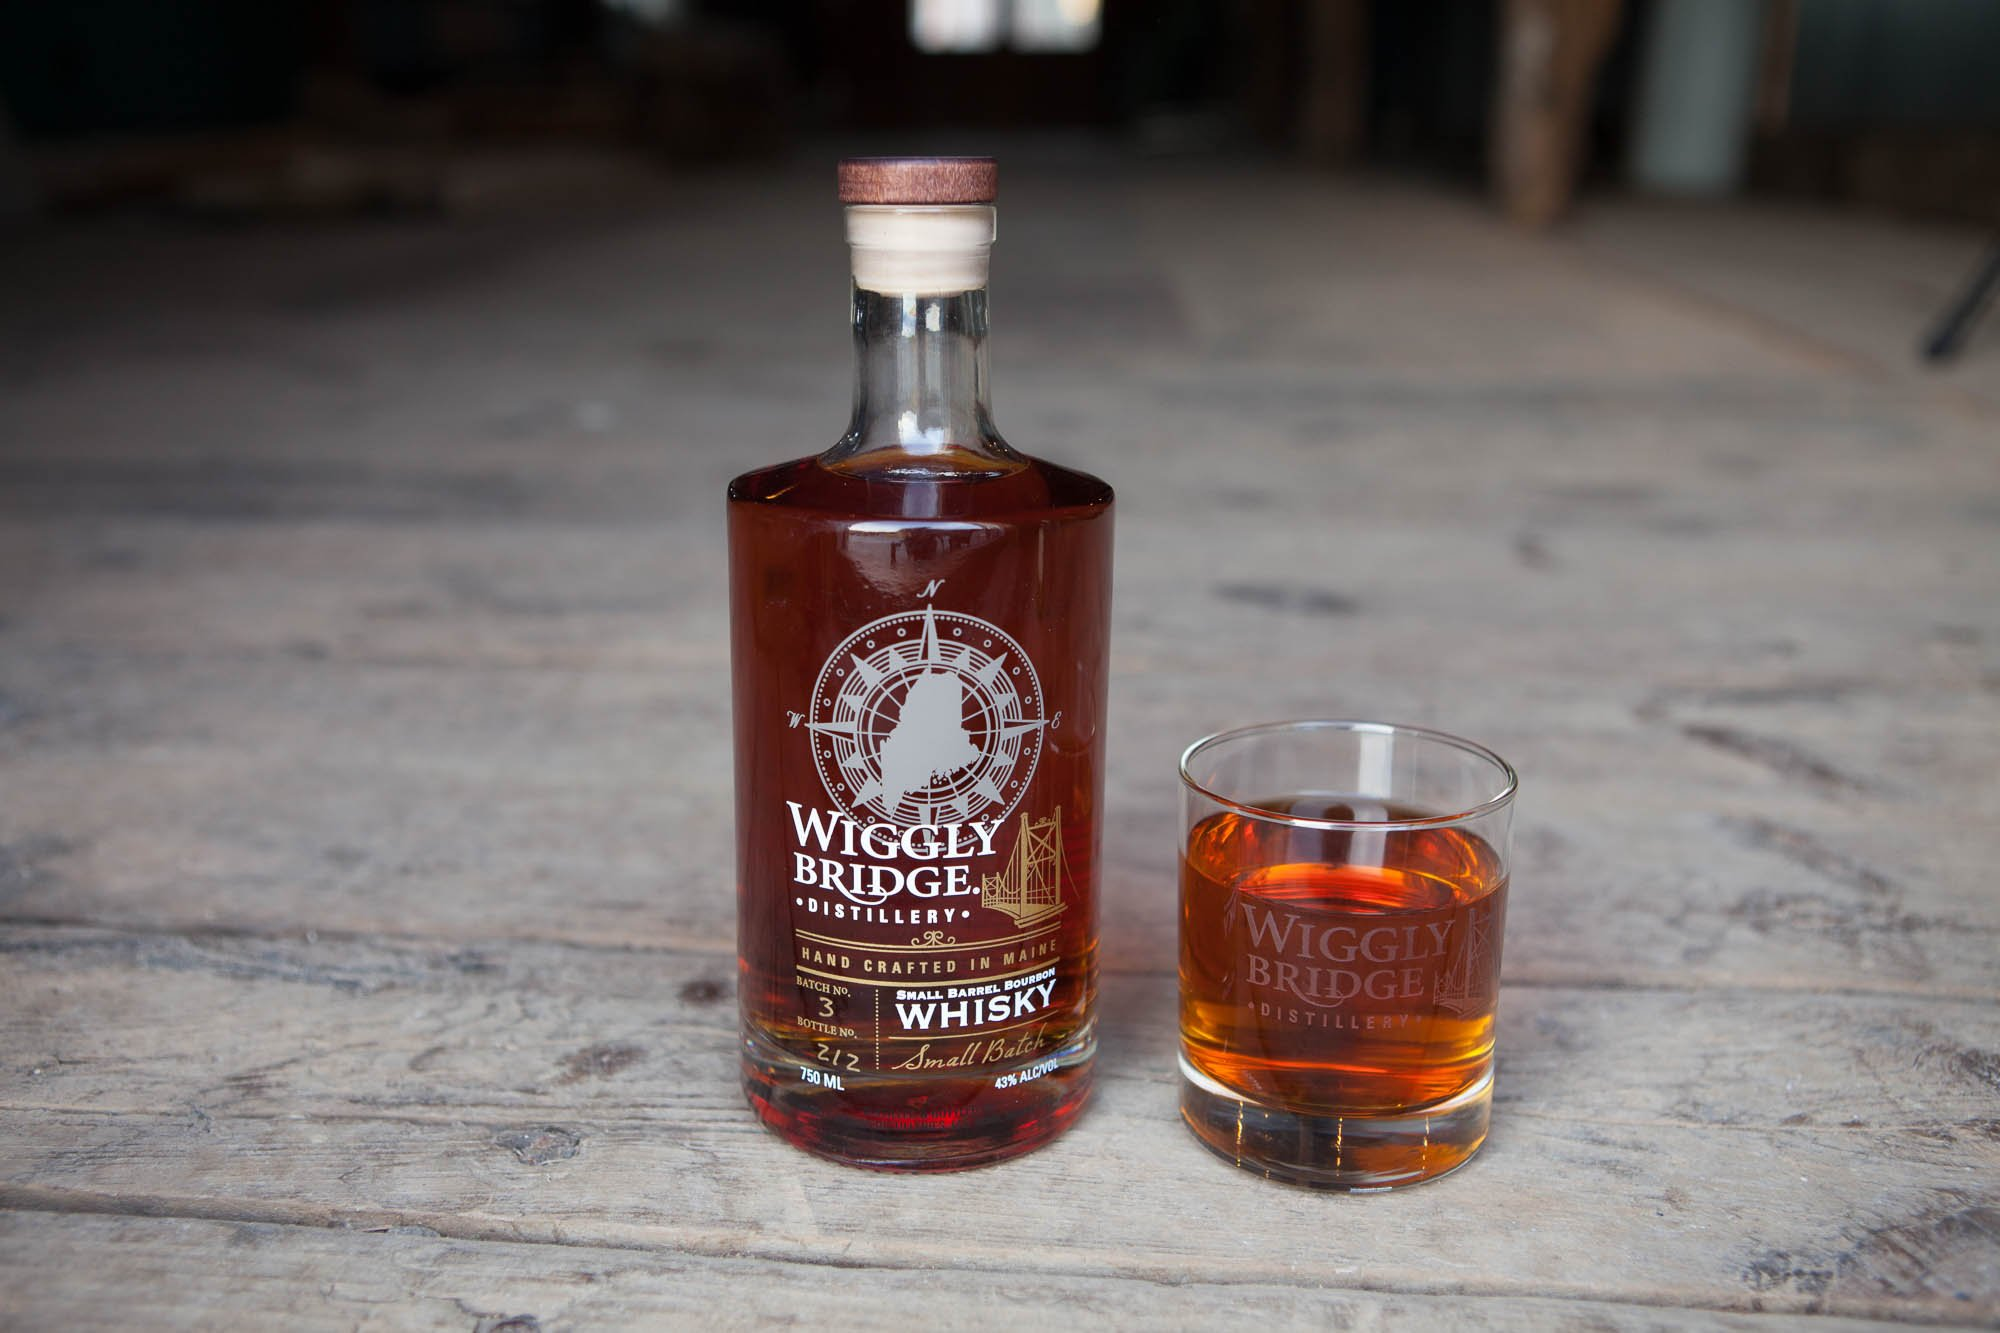 Award Winning Small Barrel Bourbon